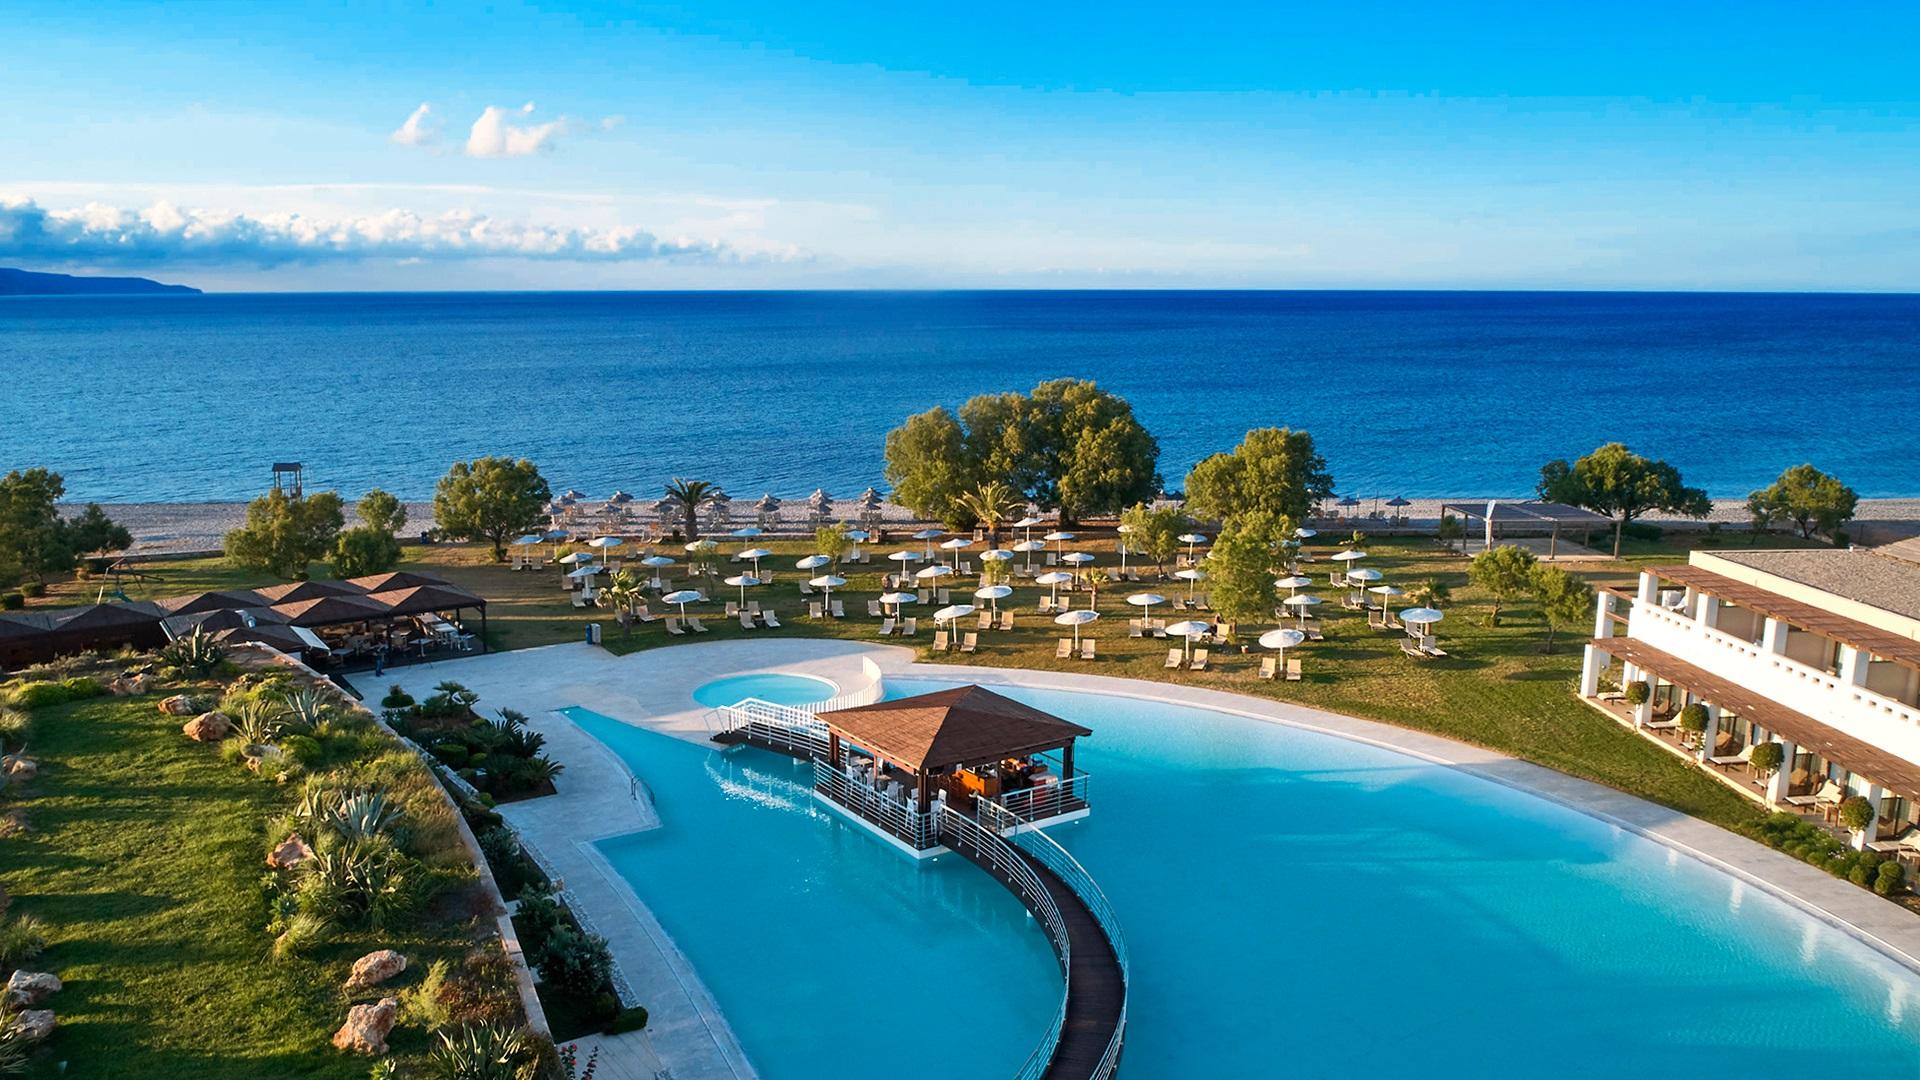 Hotel Cavo Spada Luxury Resort and Spa